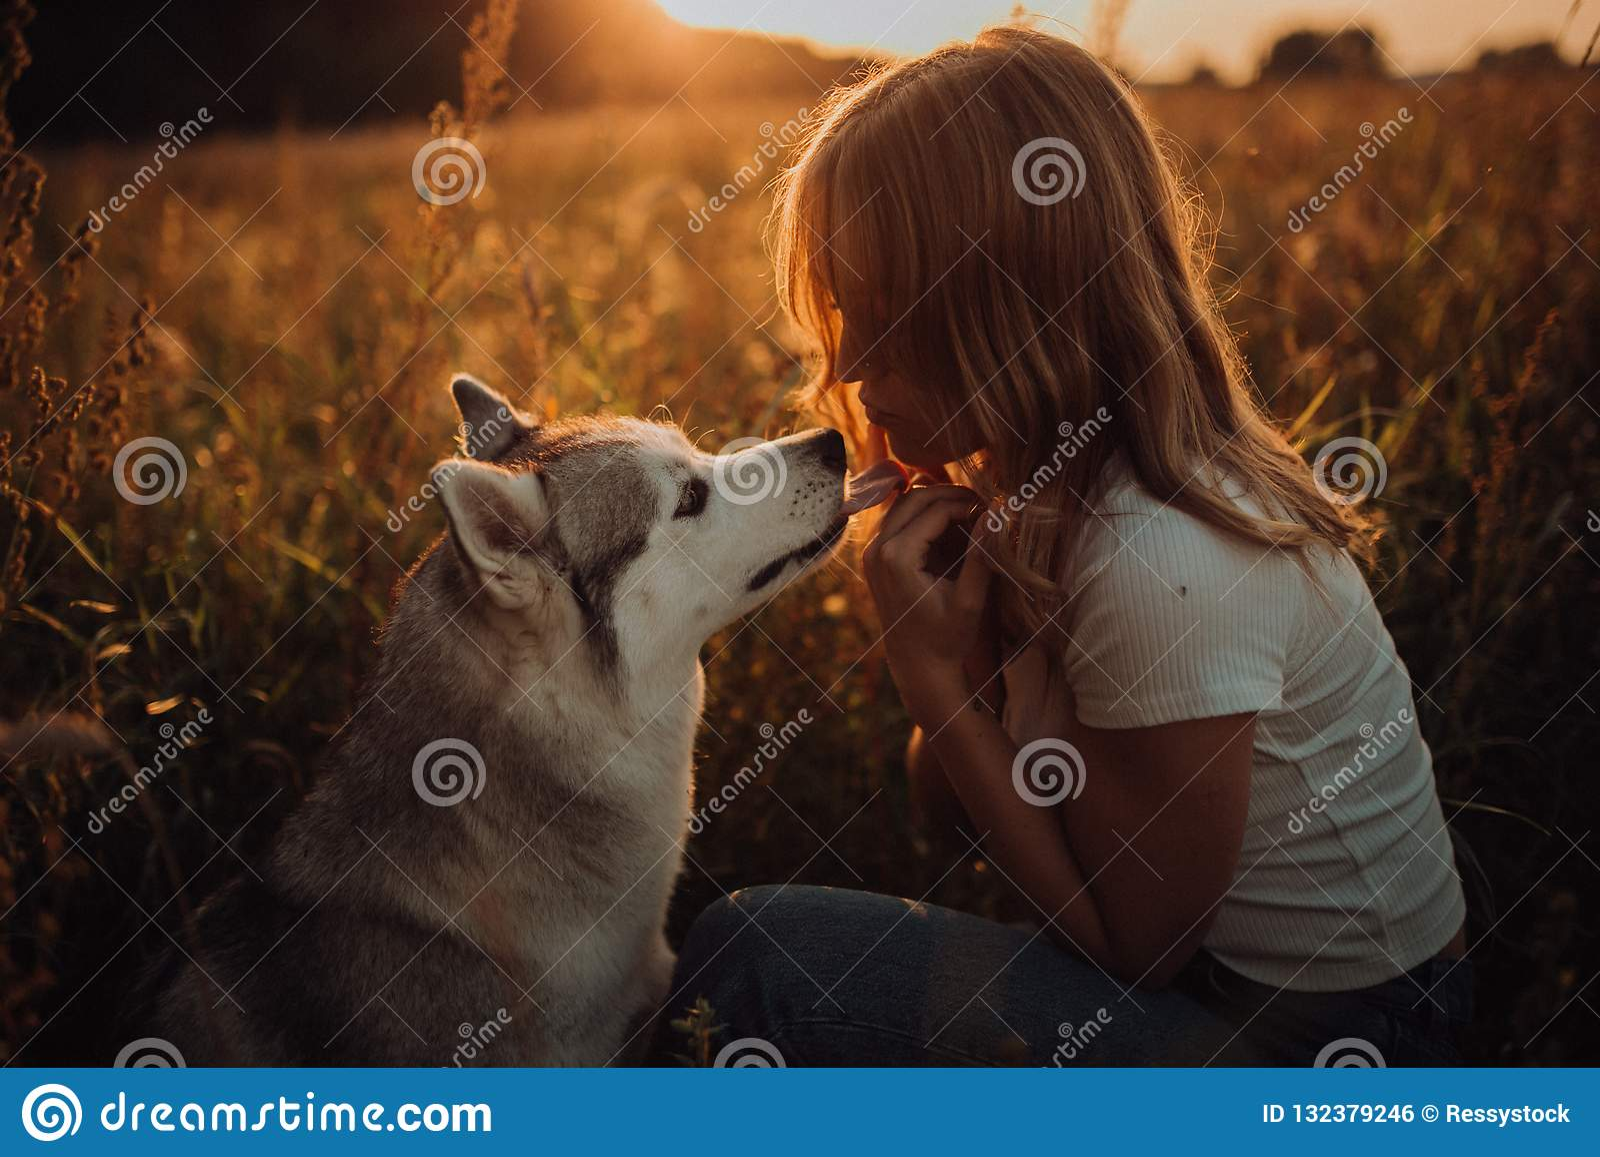 Beautiful elegant girl with dog , sunset. field background